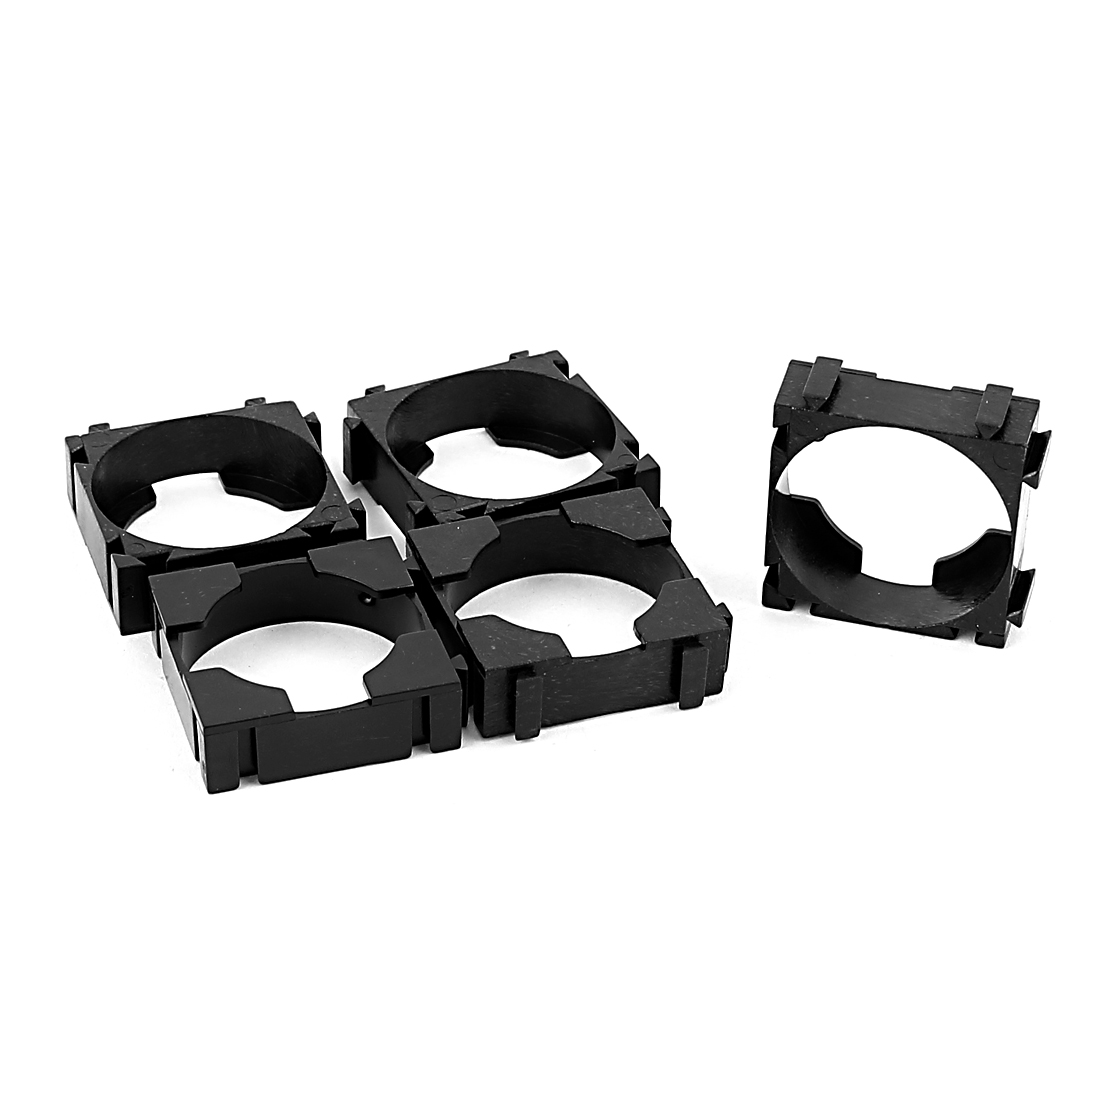 5 Pcs 26650 Lithium Ion Cell Battery Holder Bracket for DIY Battery Pack